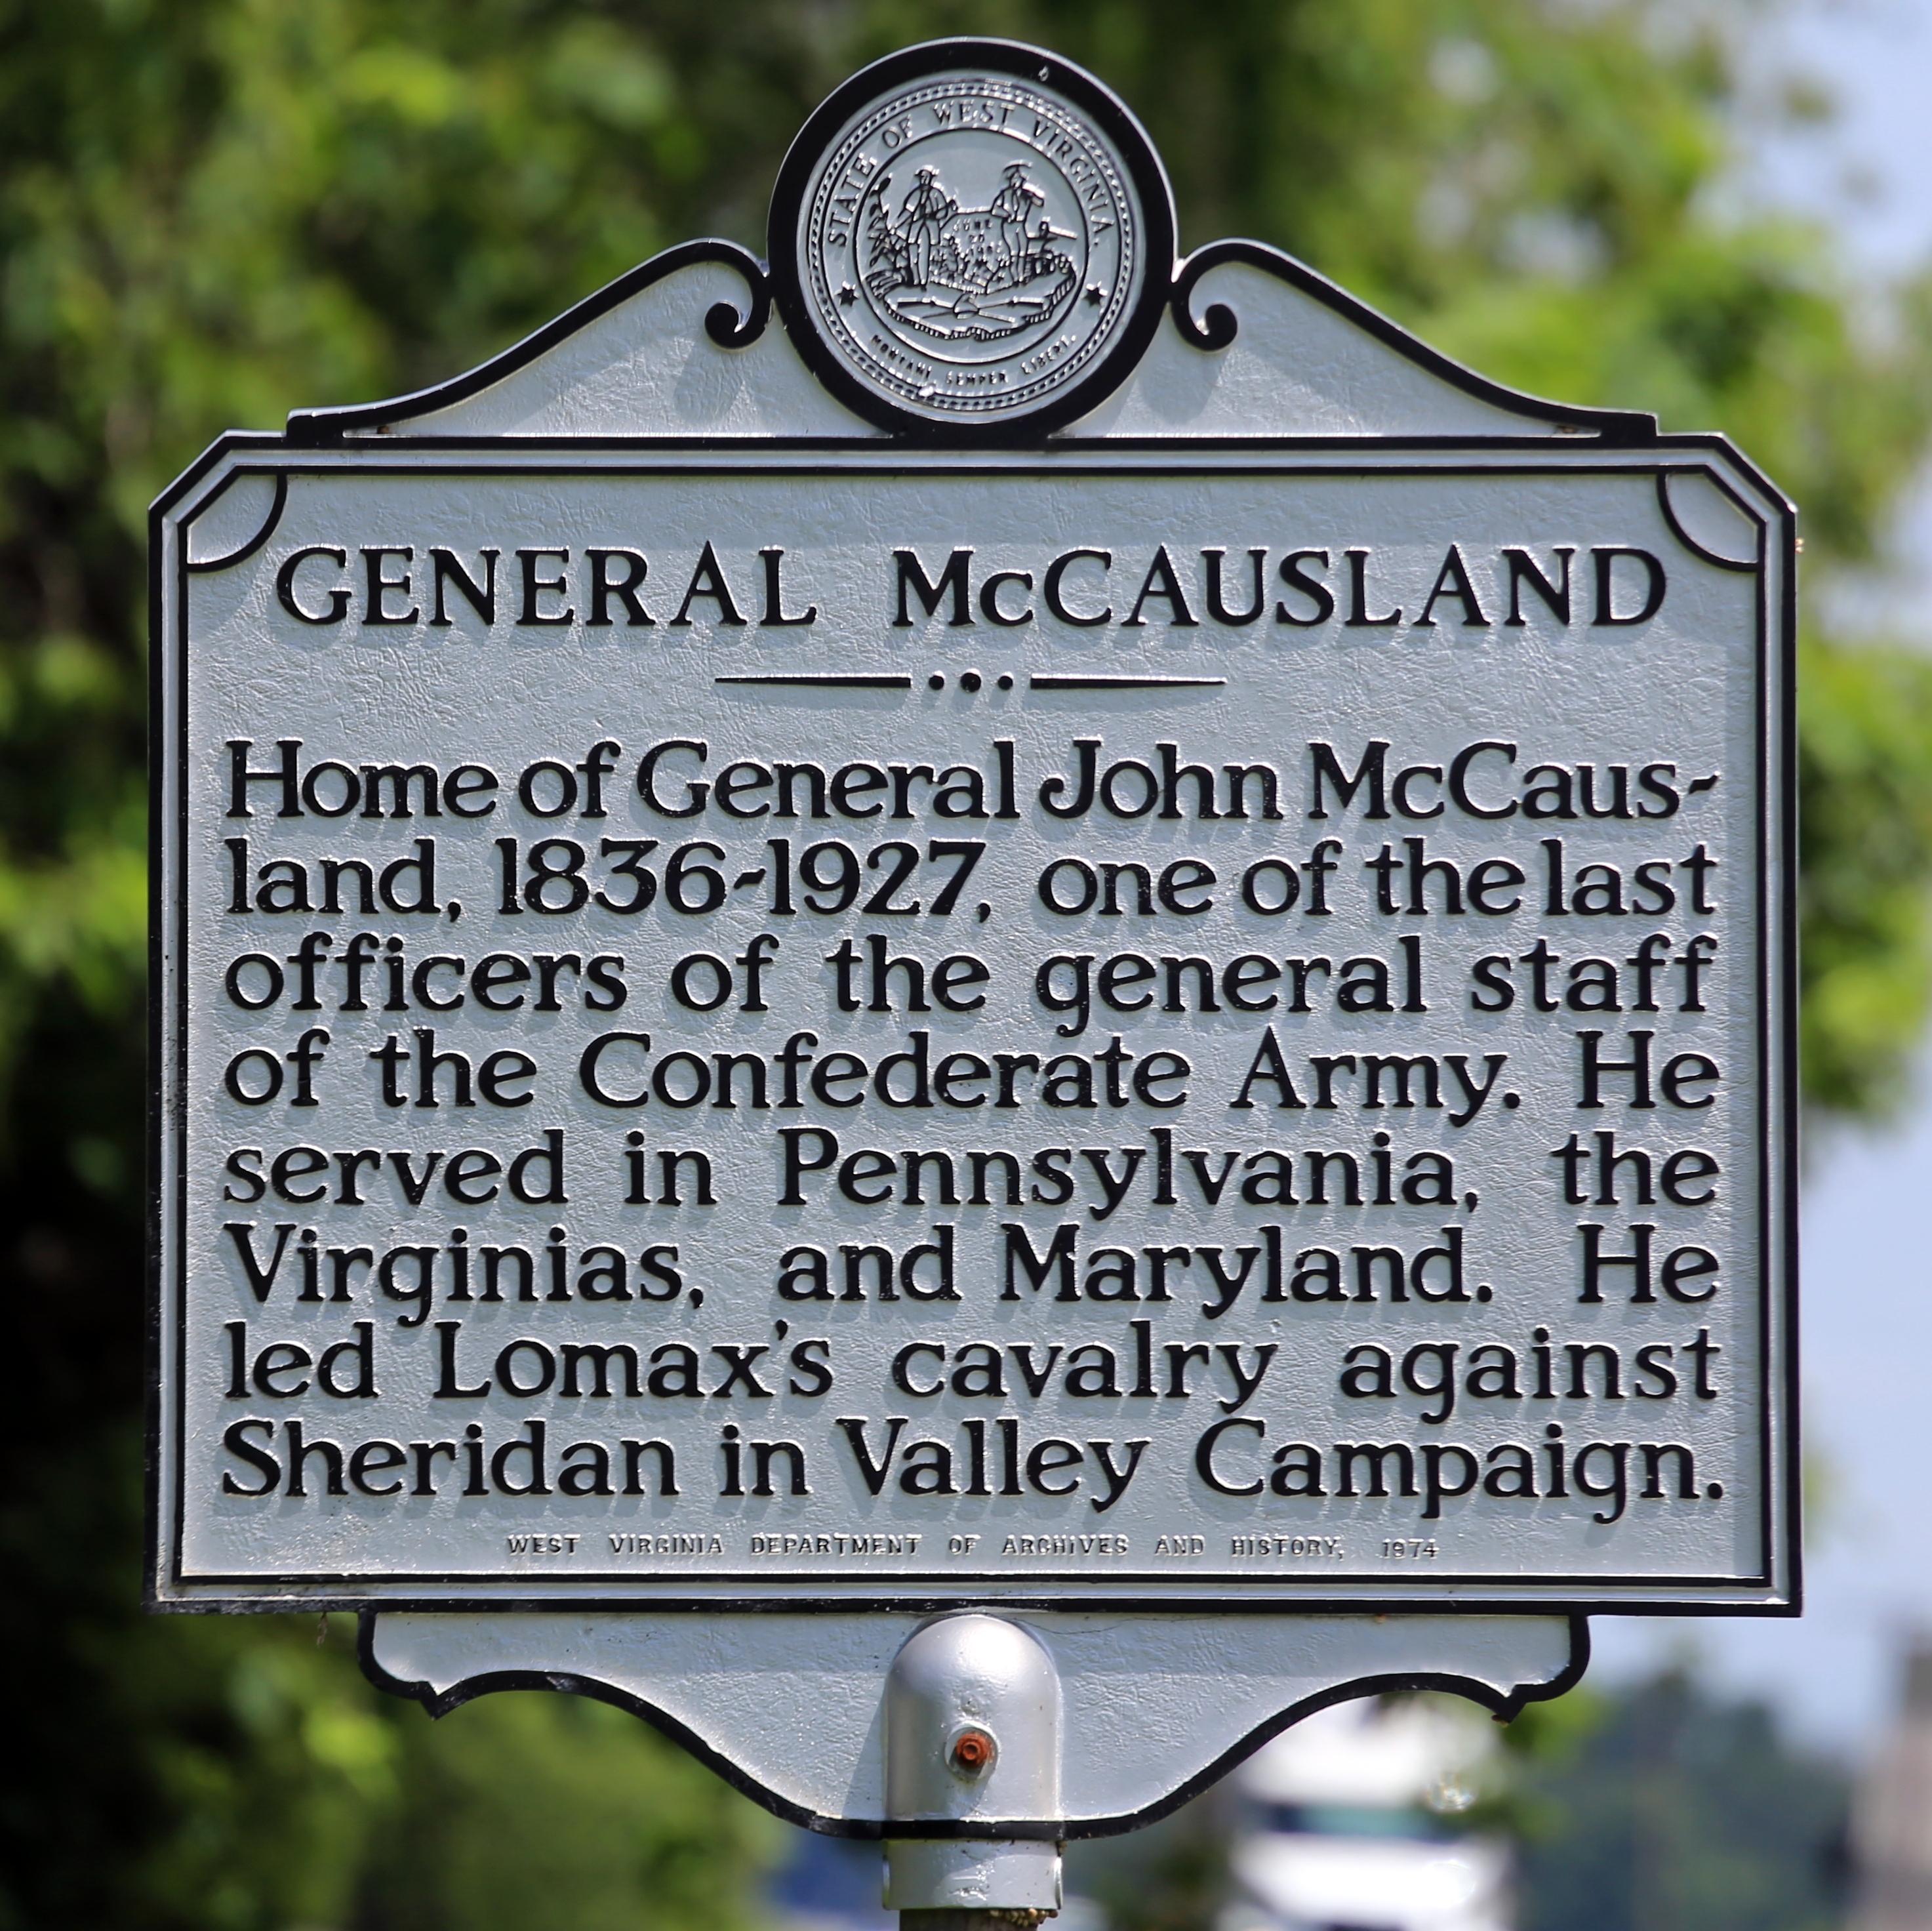 John McCausland historical harker